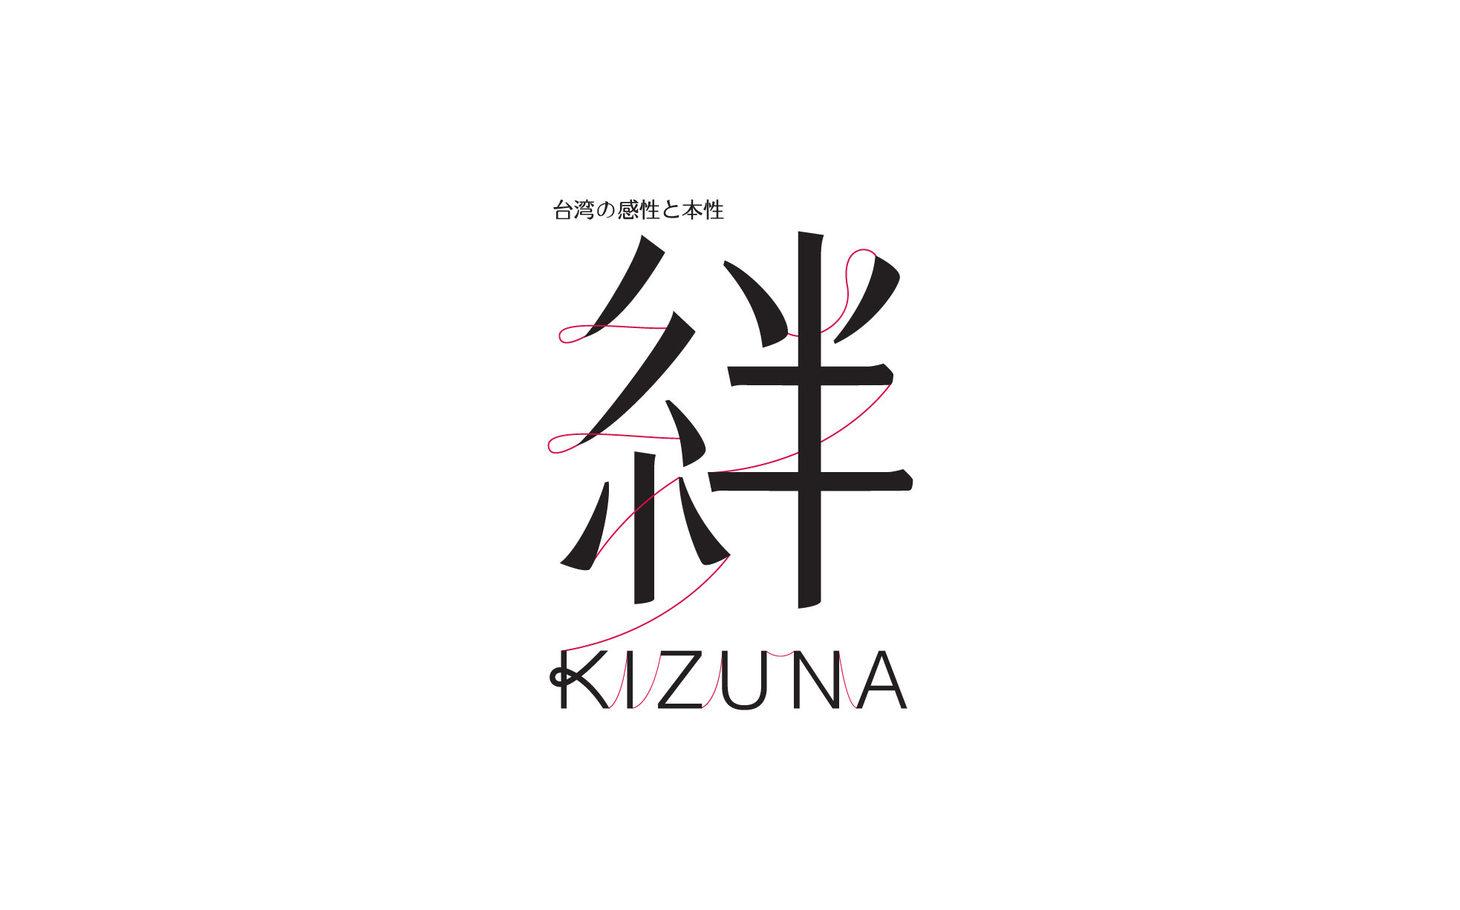 kizuna-logo.jpg